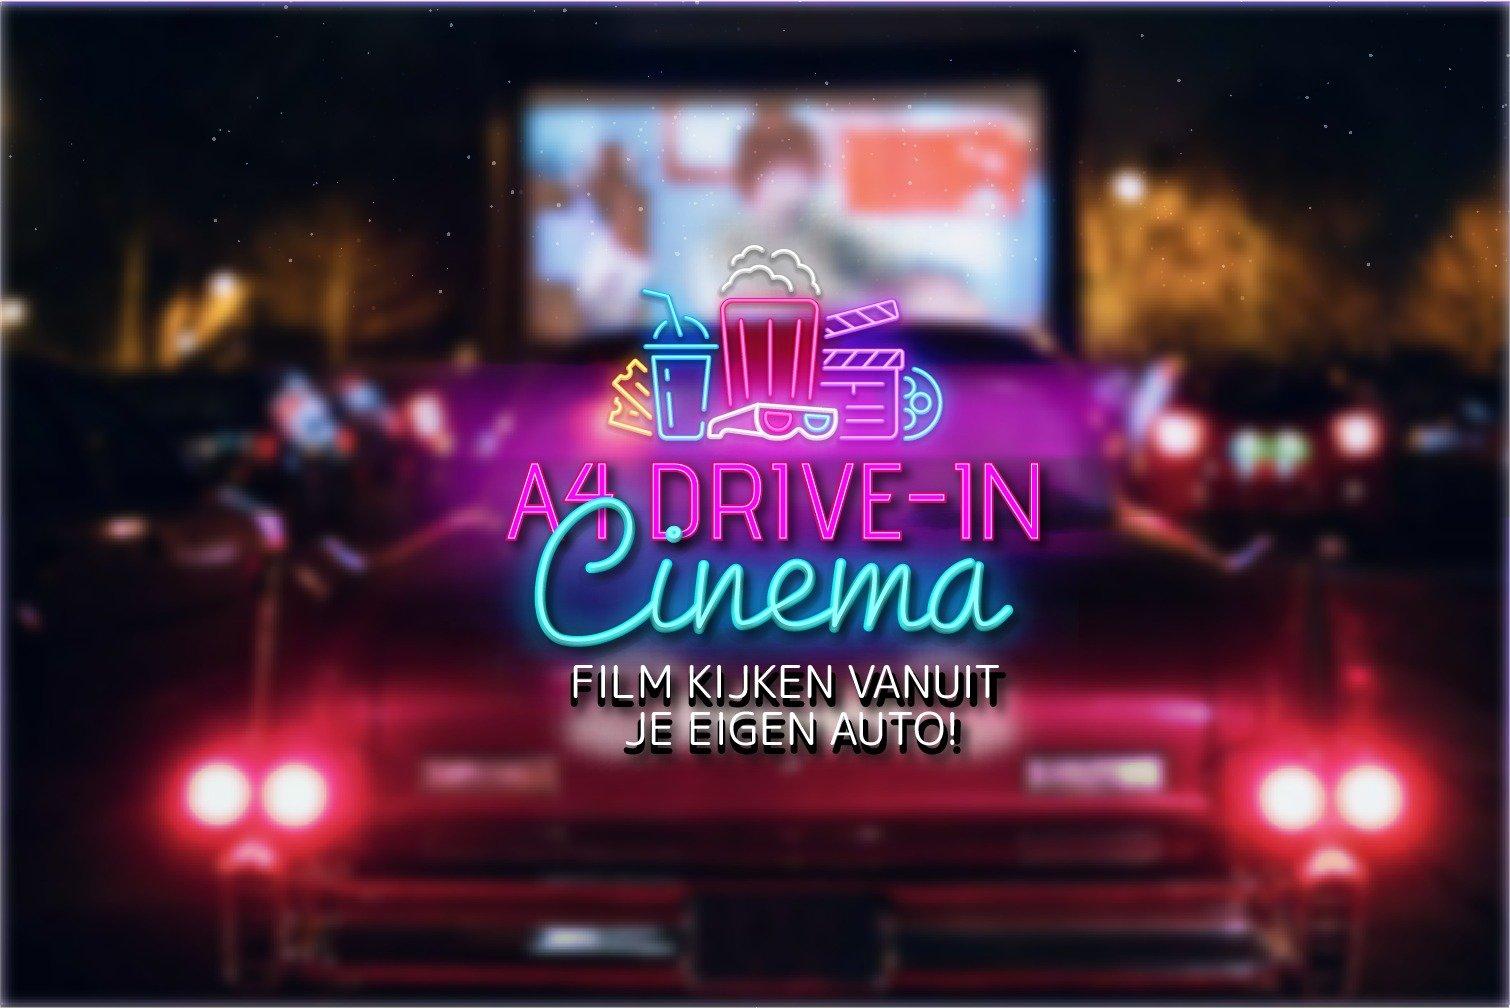 Drive-in bioscoop: Penoza